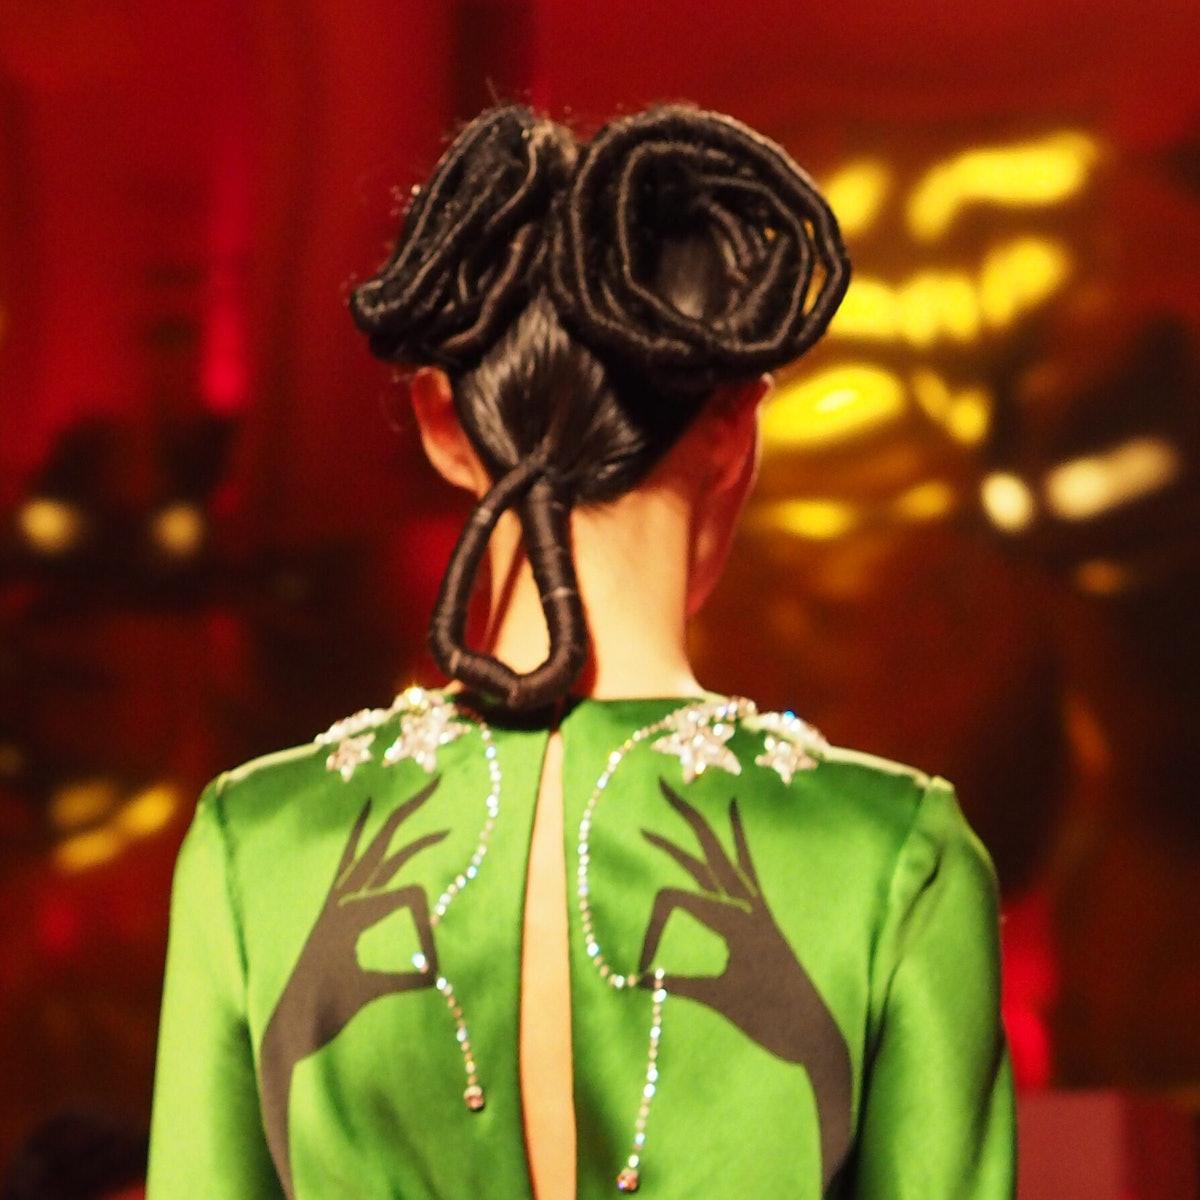 A close-up at the Schiaparelli Spring 2015 Couture show